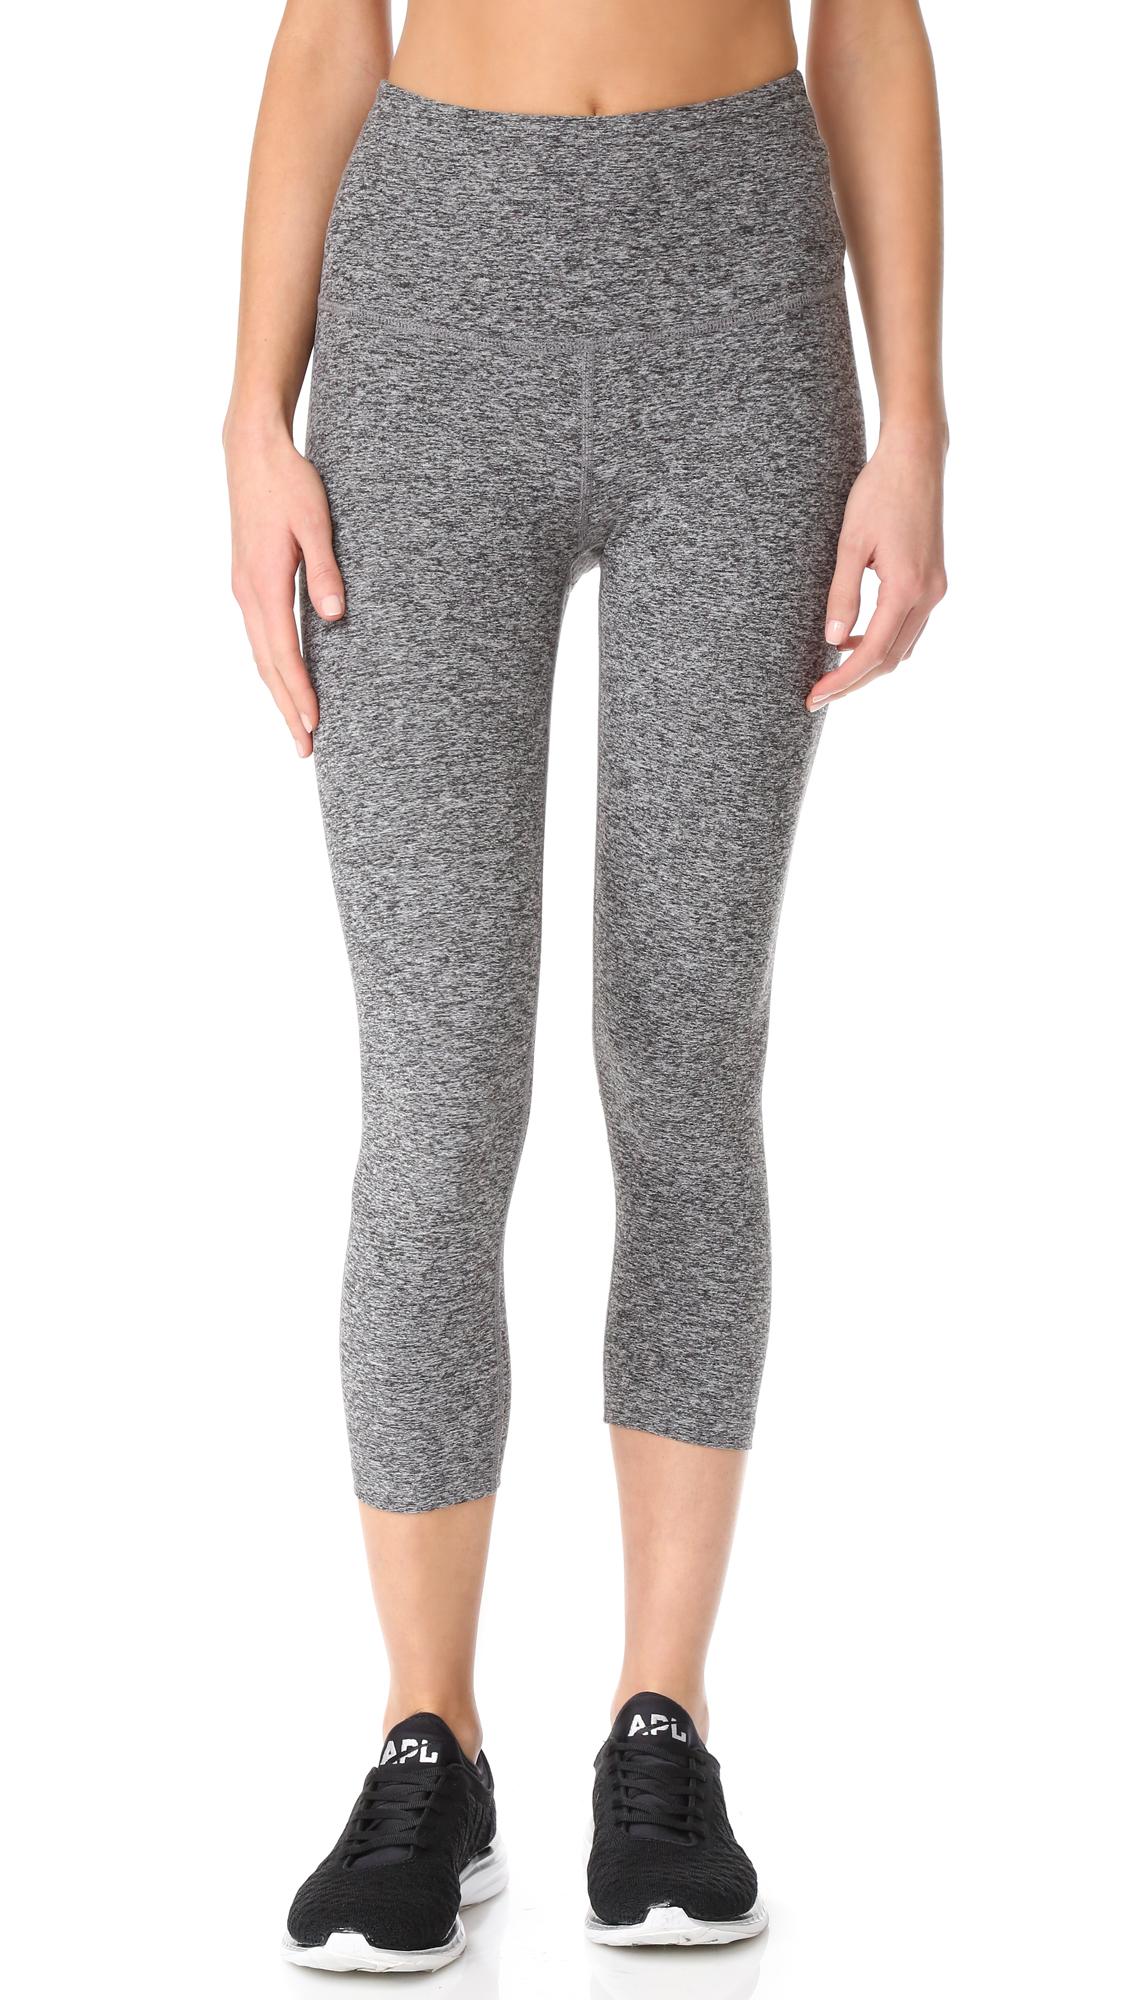 Beyond Yoga High Waist Capri Leggings - Black/White